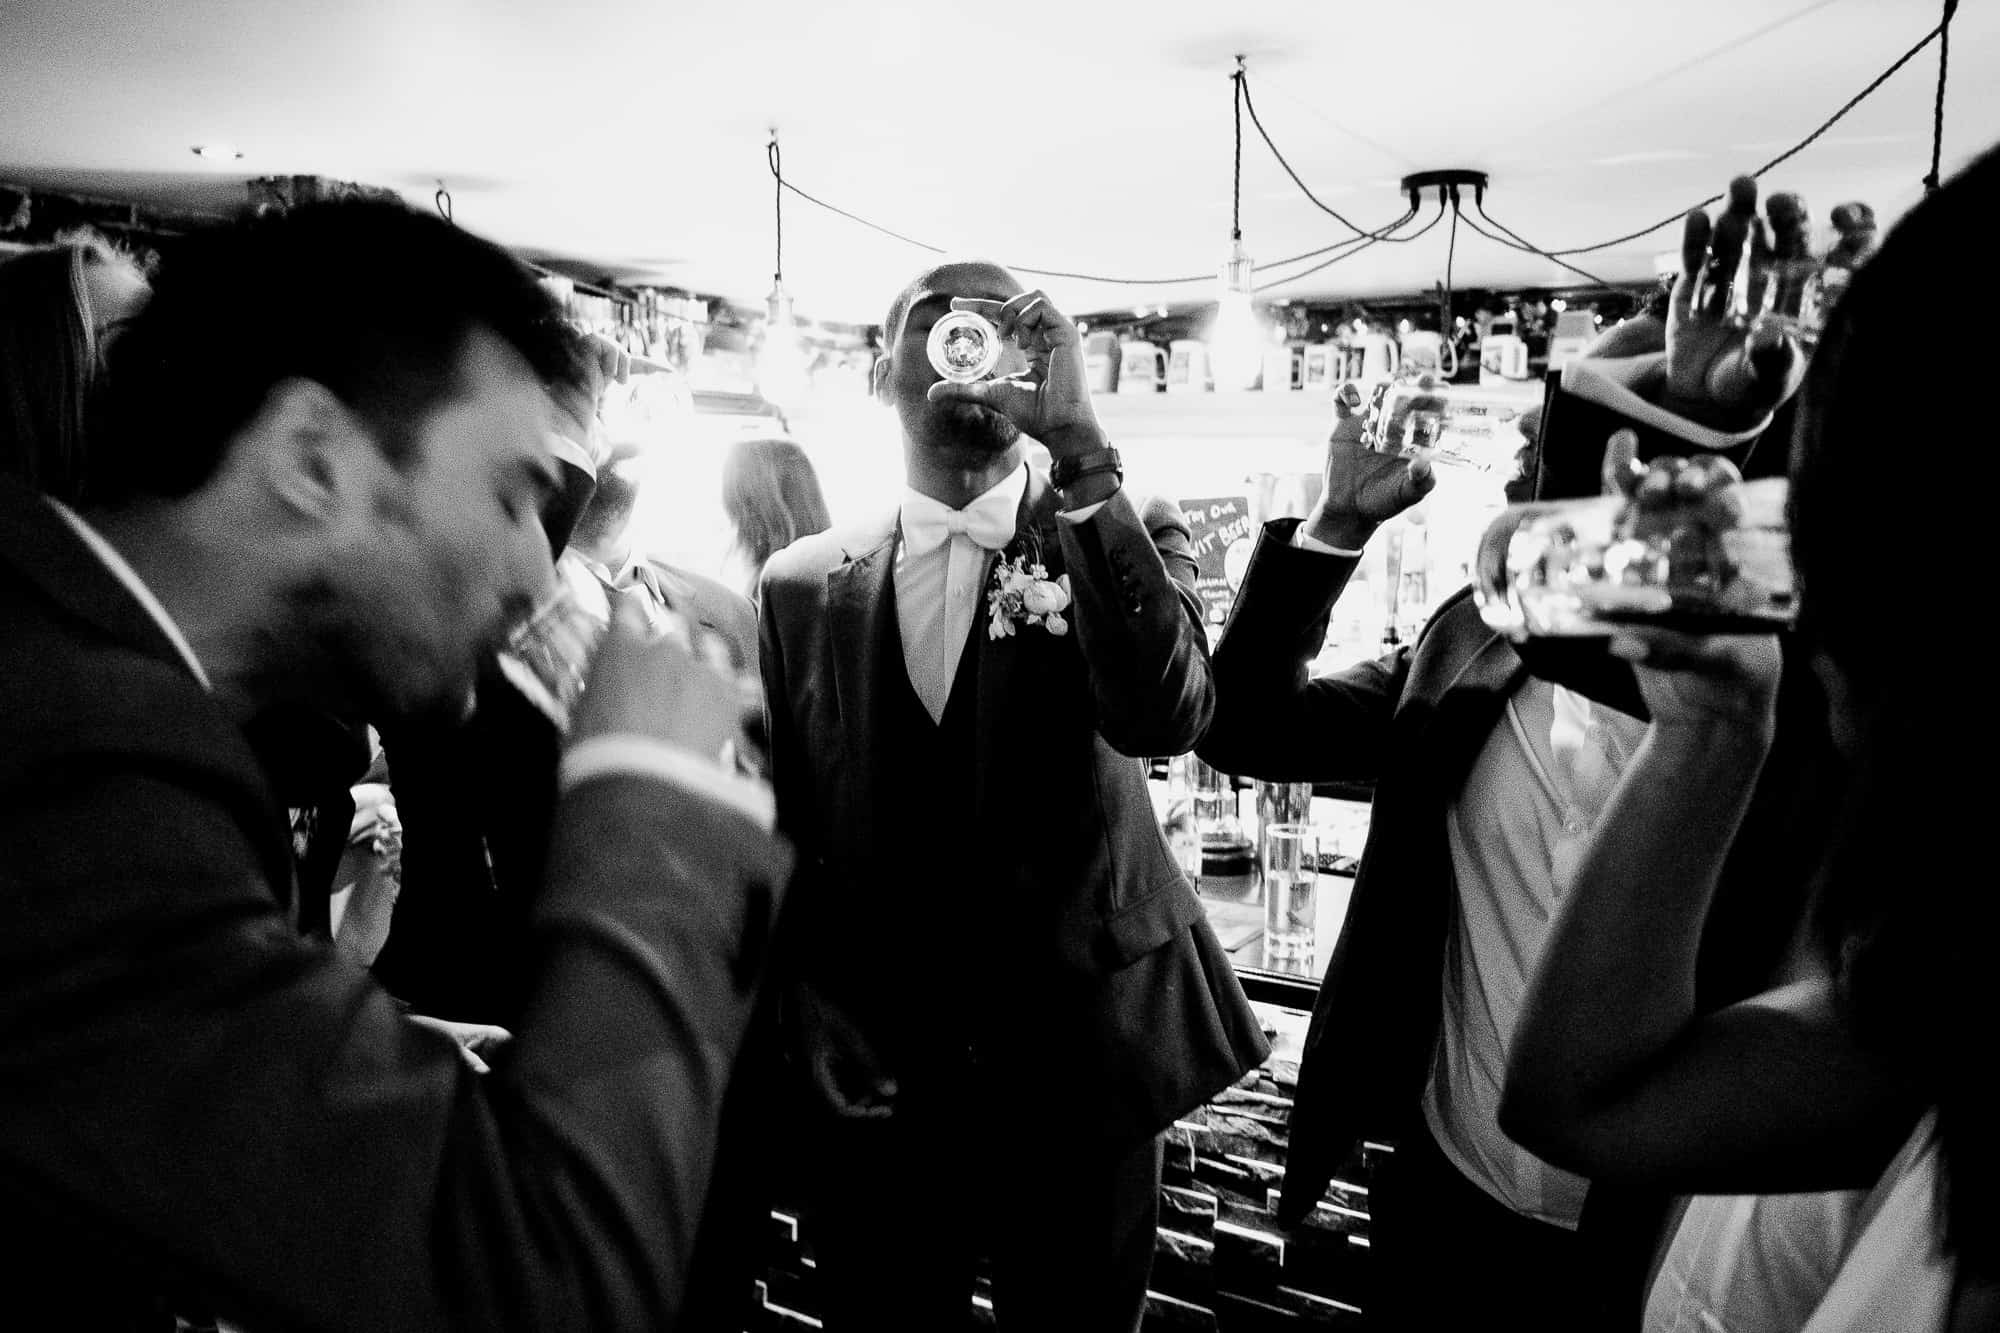 marleybrook-house-wedding-photography-matt-tyler-0071